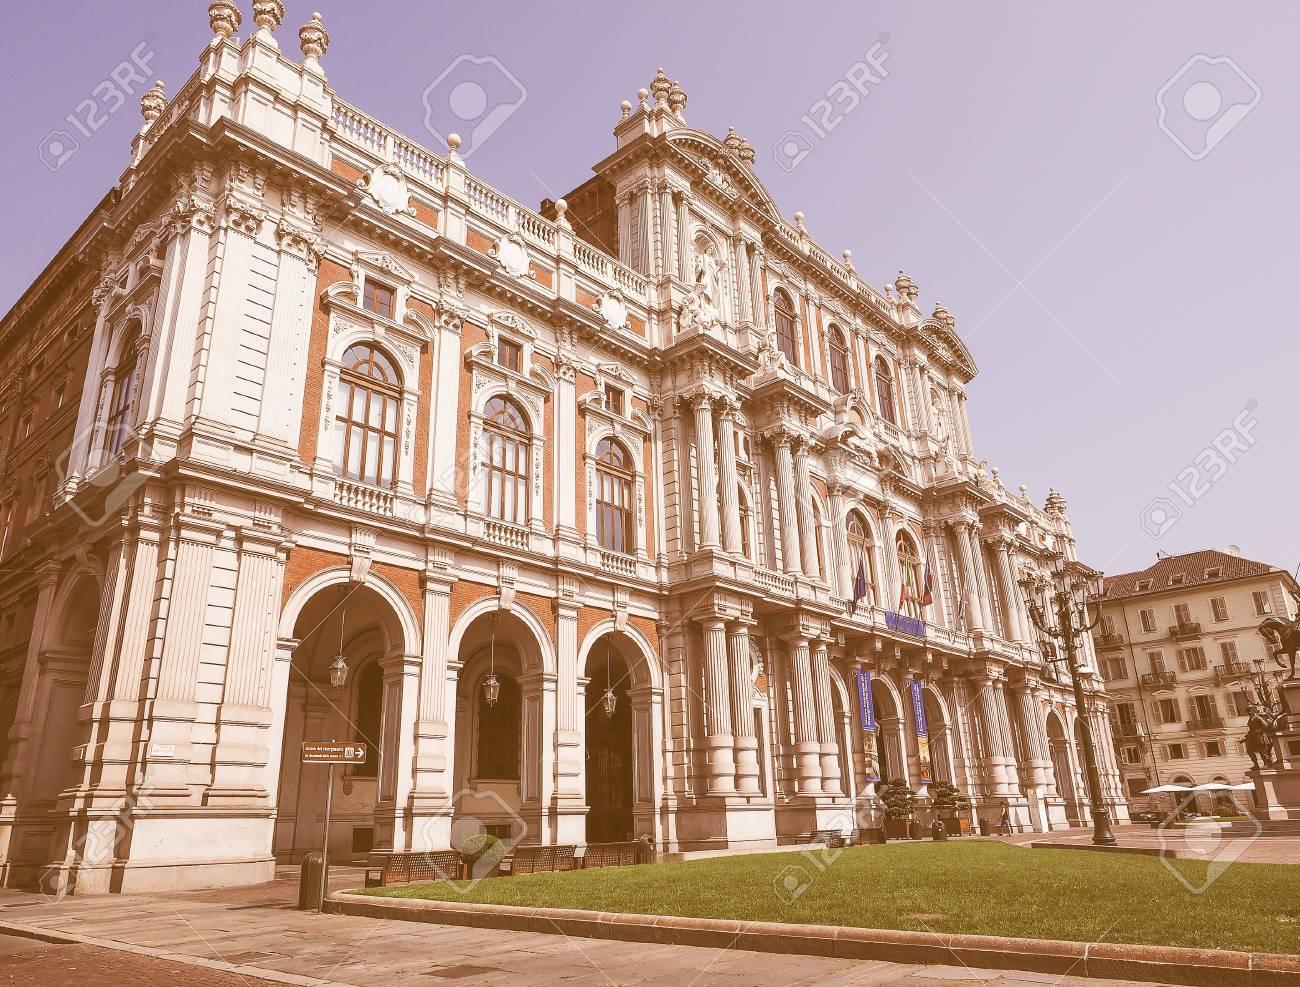 Museo Nazionale Del Risorgimento Italiano.Turin Italy August 05 2015 The National Museum Of The Italian